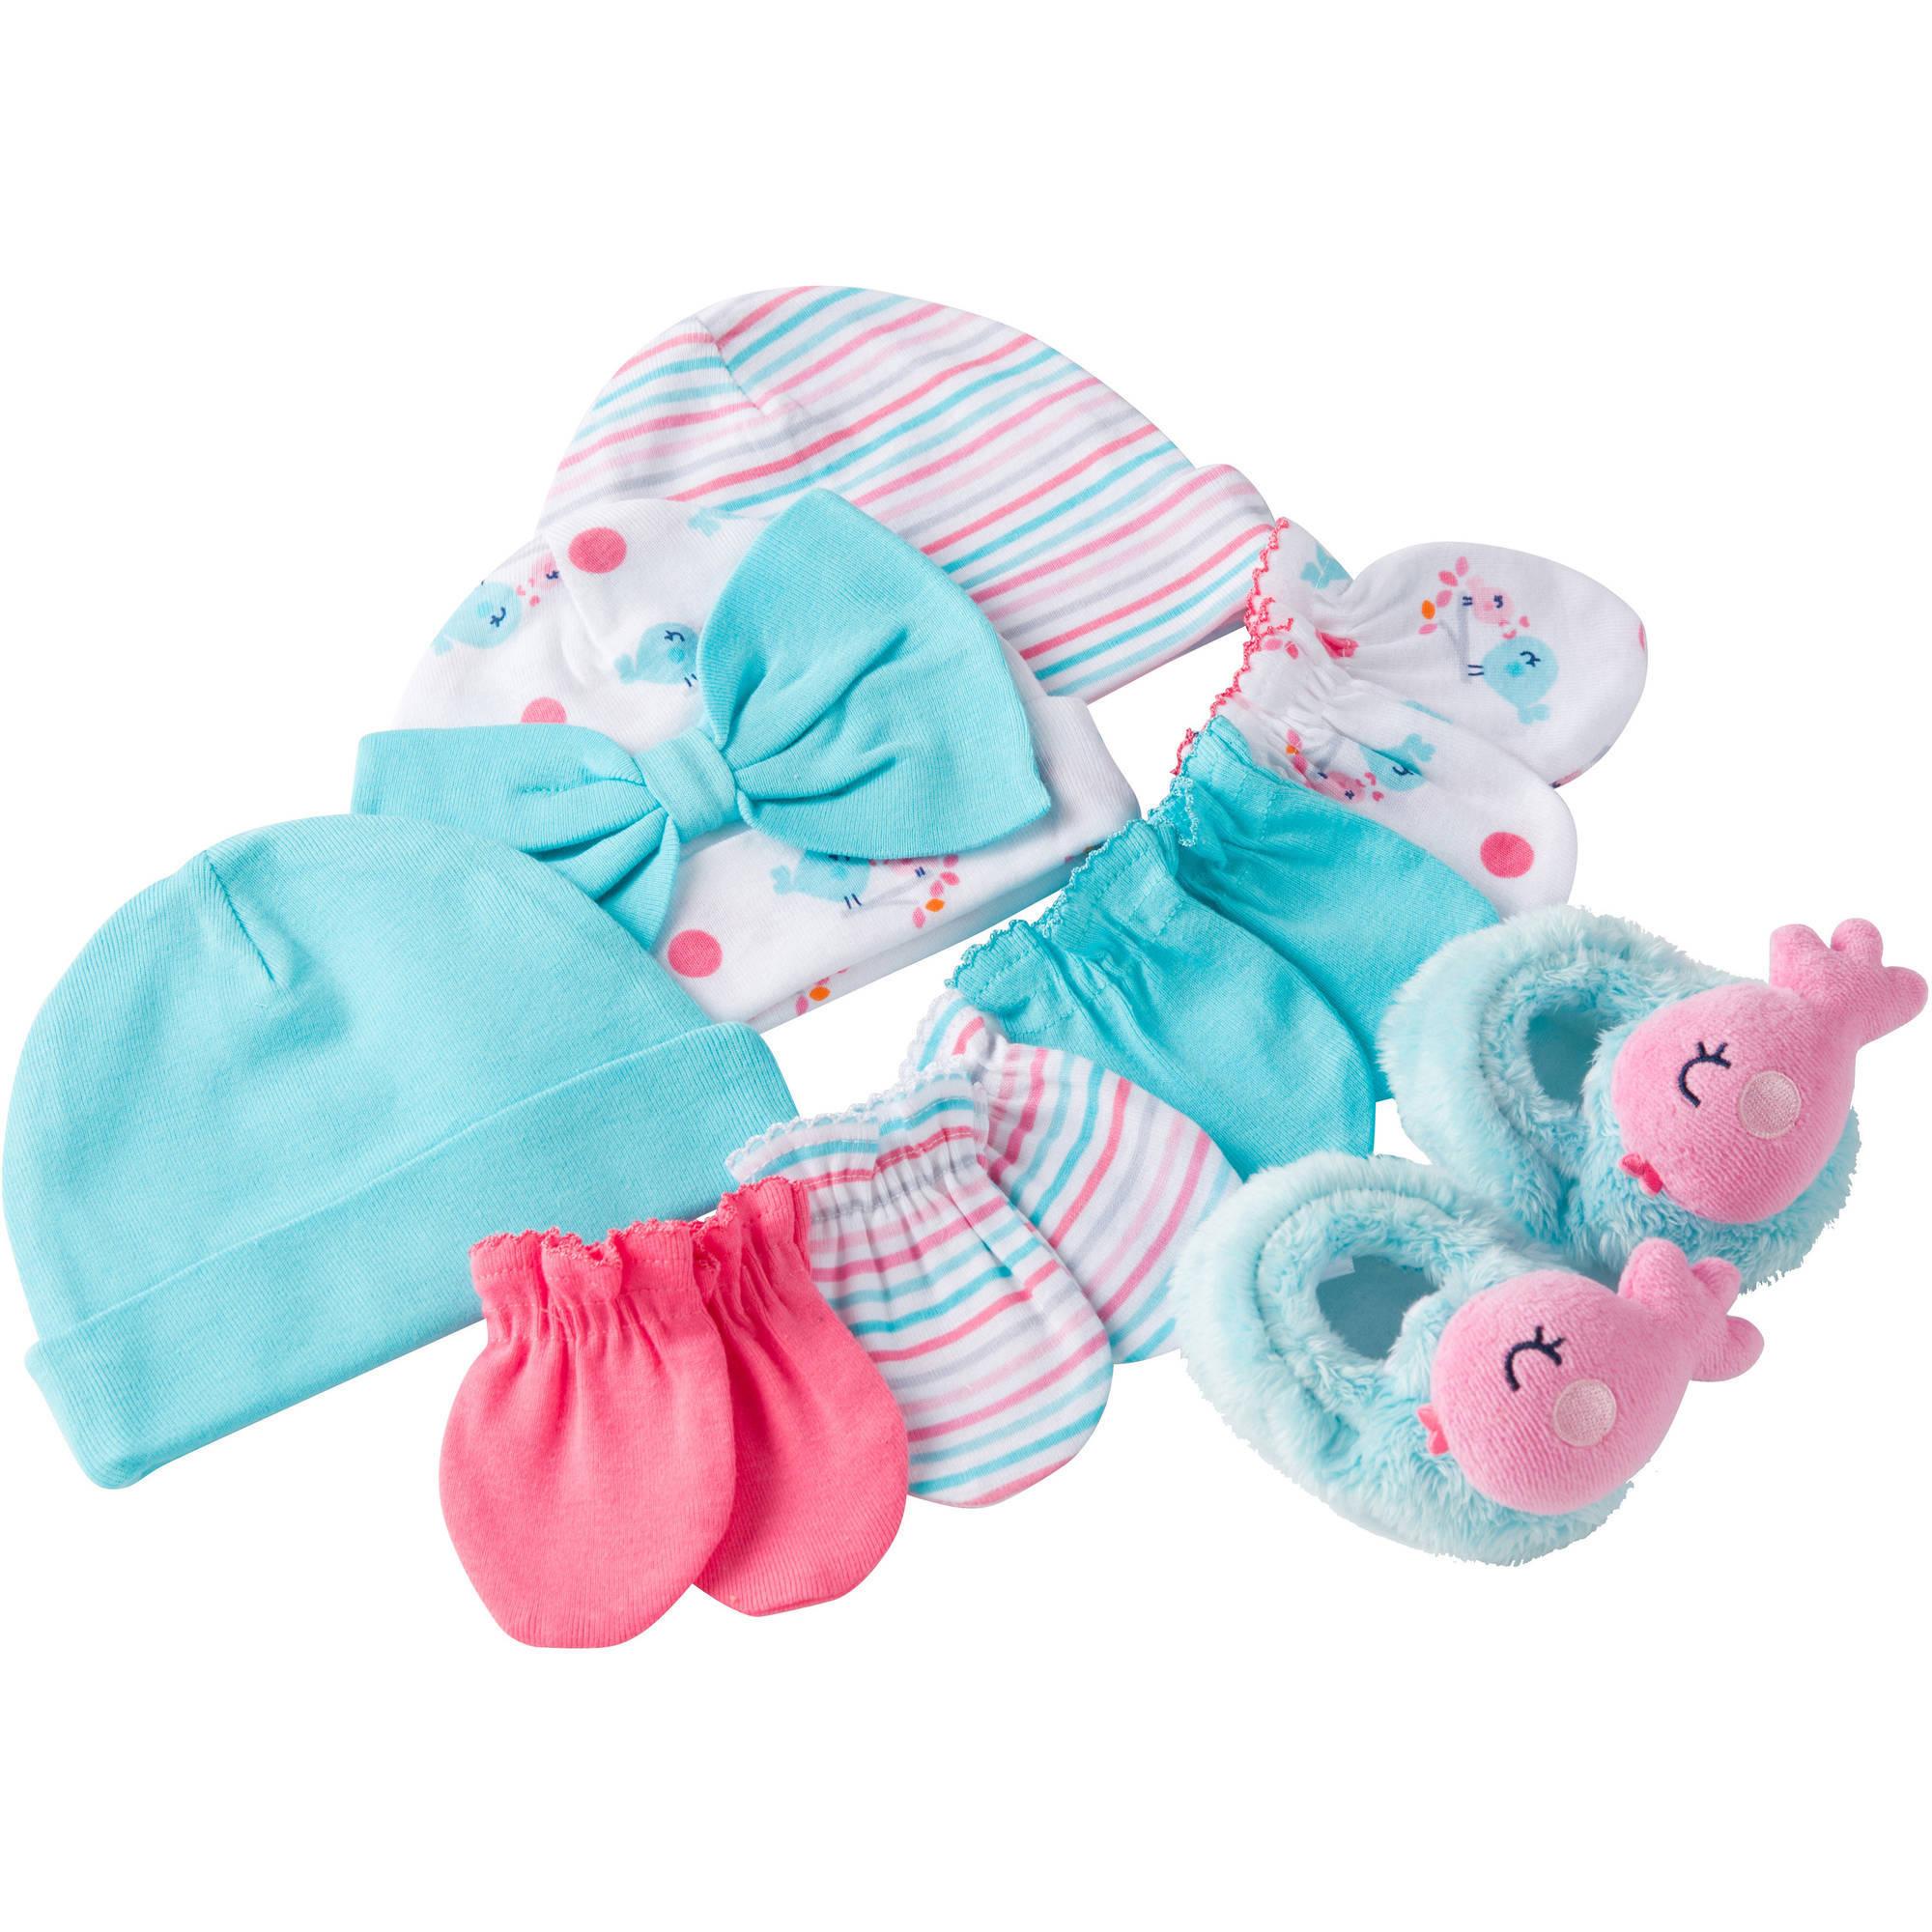 Gerber Newborn Baby Girl Caps, Mittens and Booties Accessory Gift Set, 8-Piece